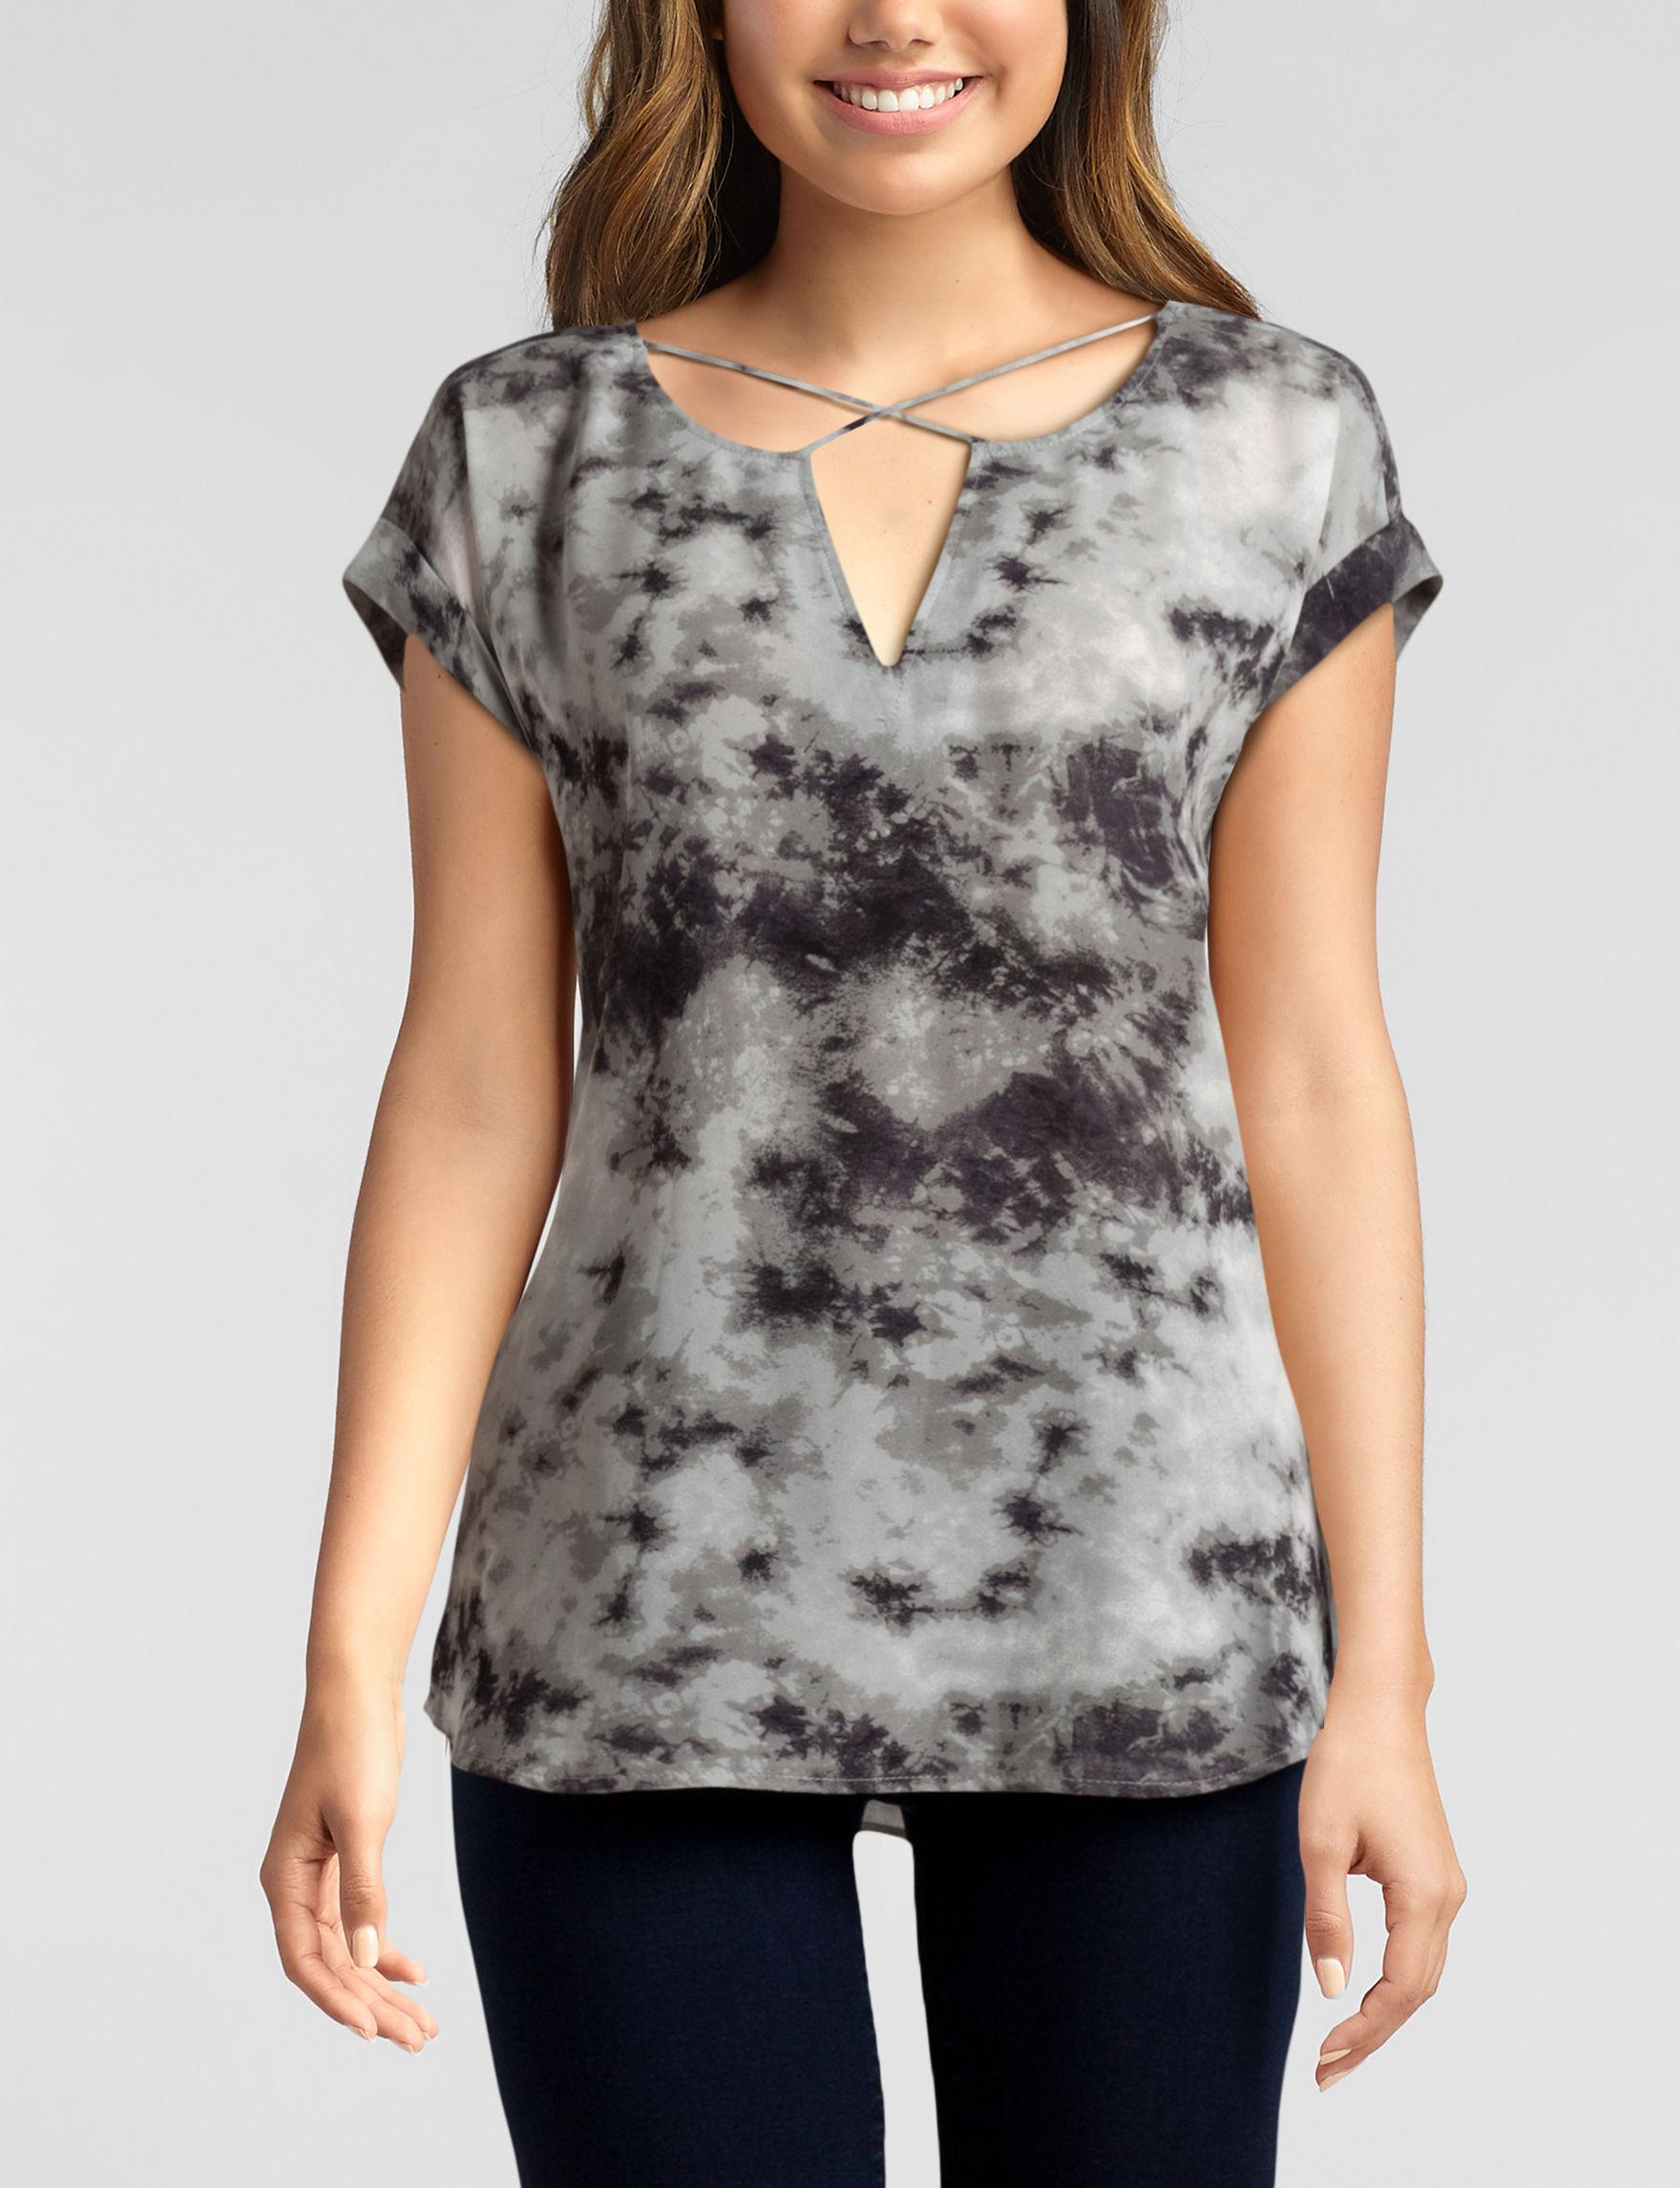 Wishful Park Grey Shirts & Blouses